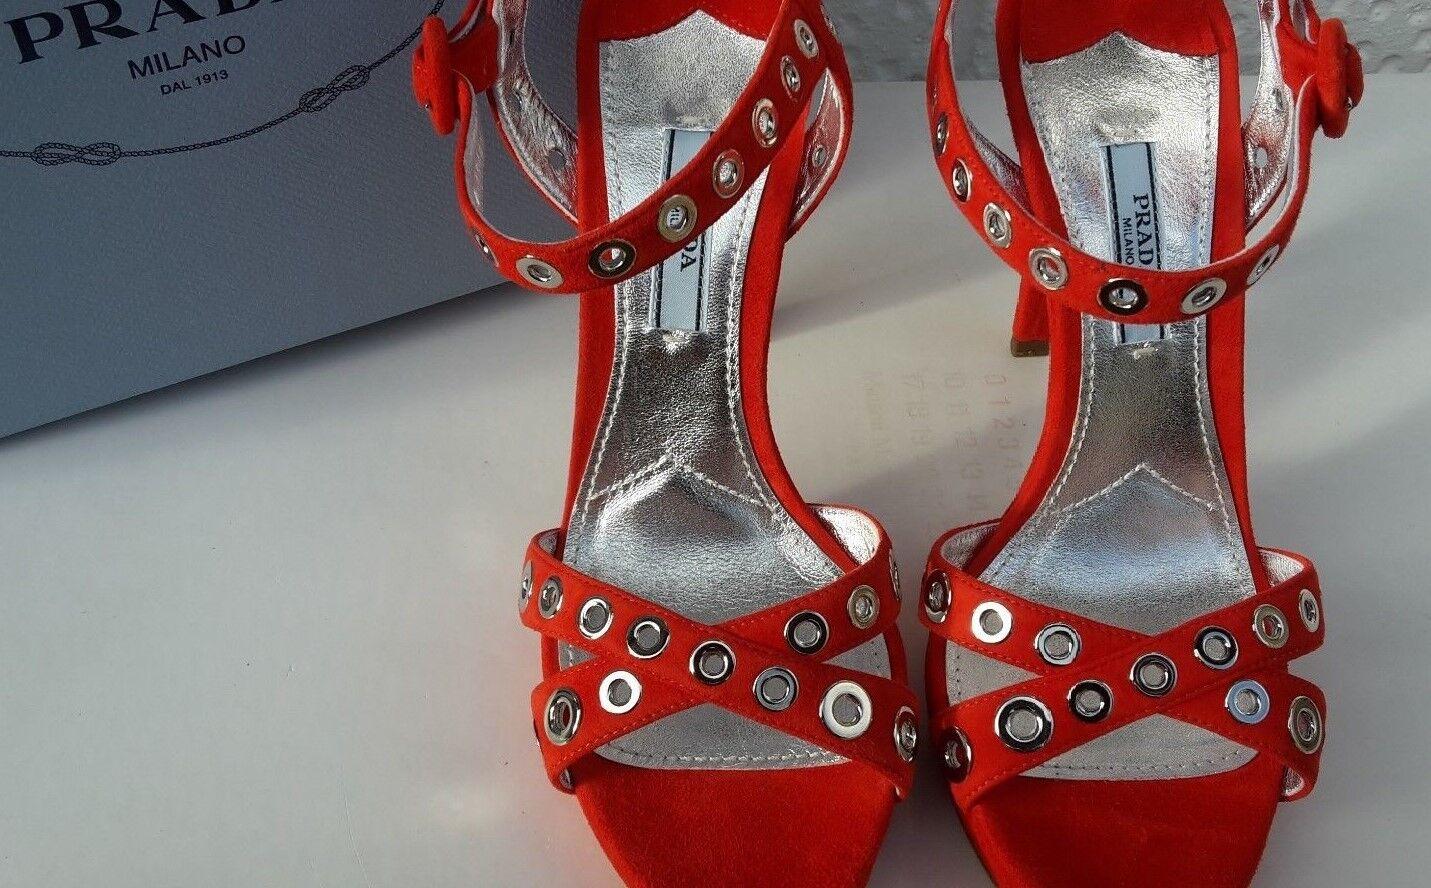 PRADA rot rot rot Sandals 5 38. Silber Eyelets Buy New 5f225b